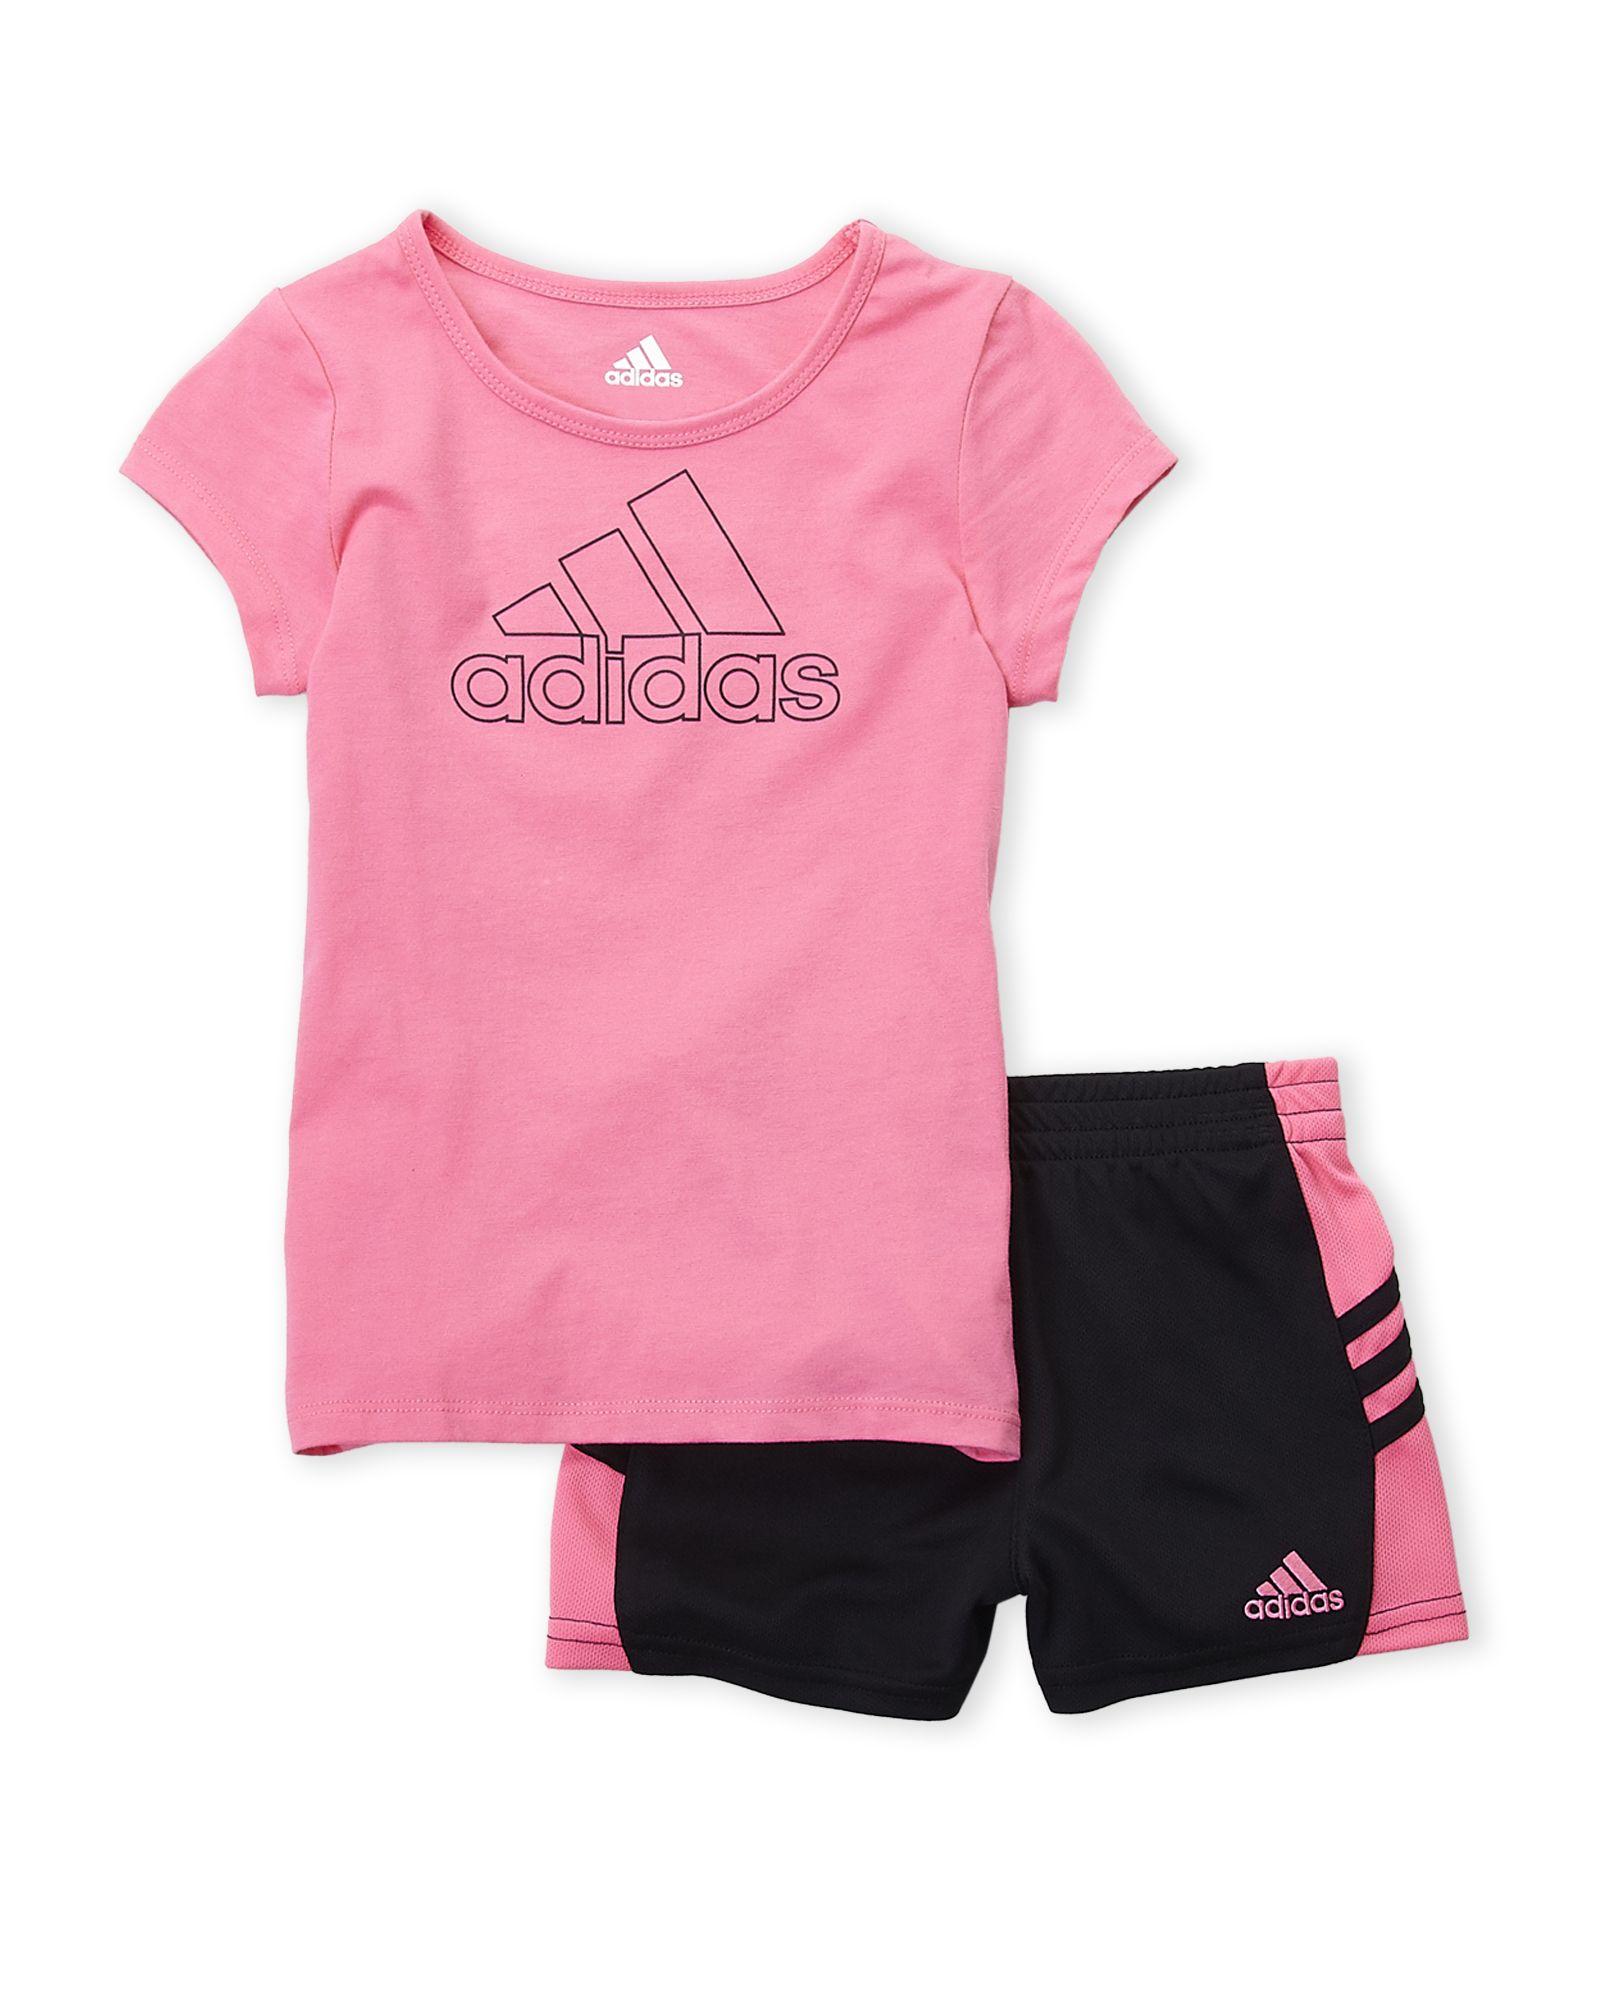 87c851f5 Infant Girls) Two-Piece Logo Tee & Side Stripe Shorts Set in 2019 ...